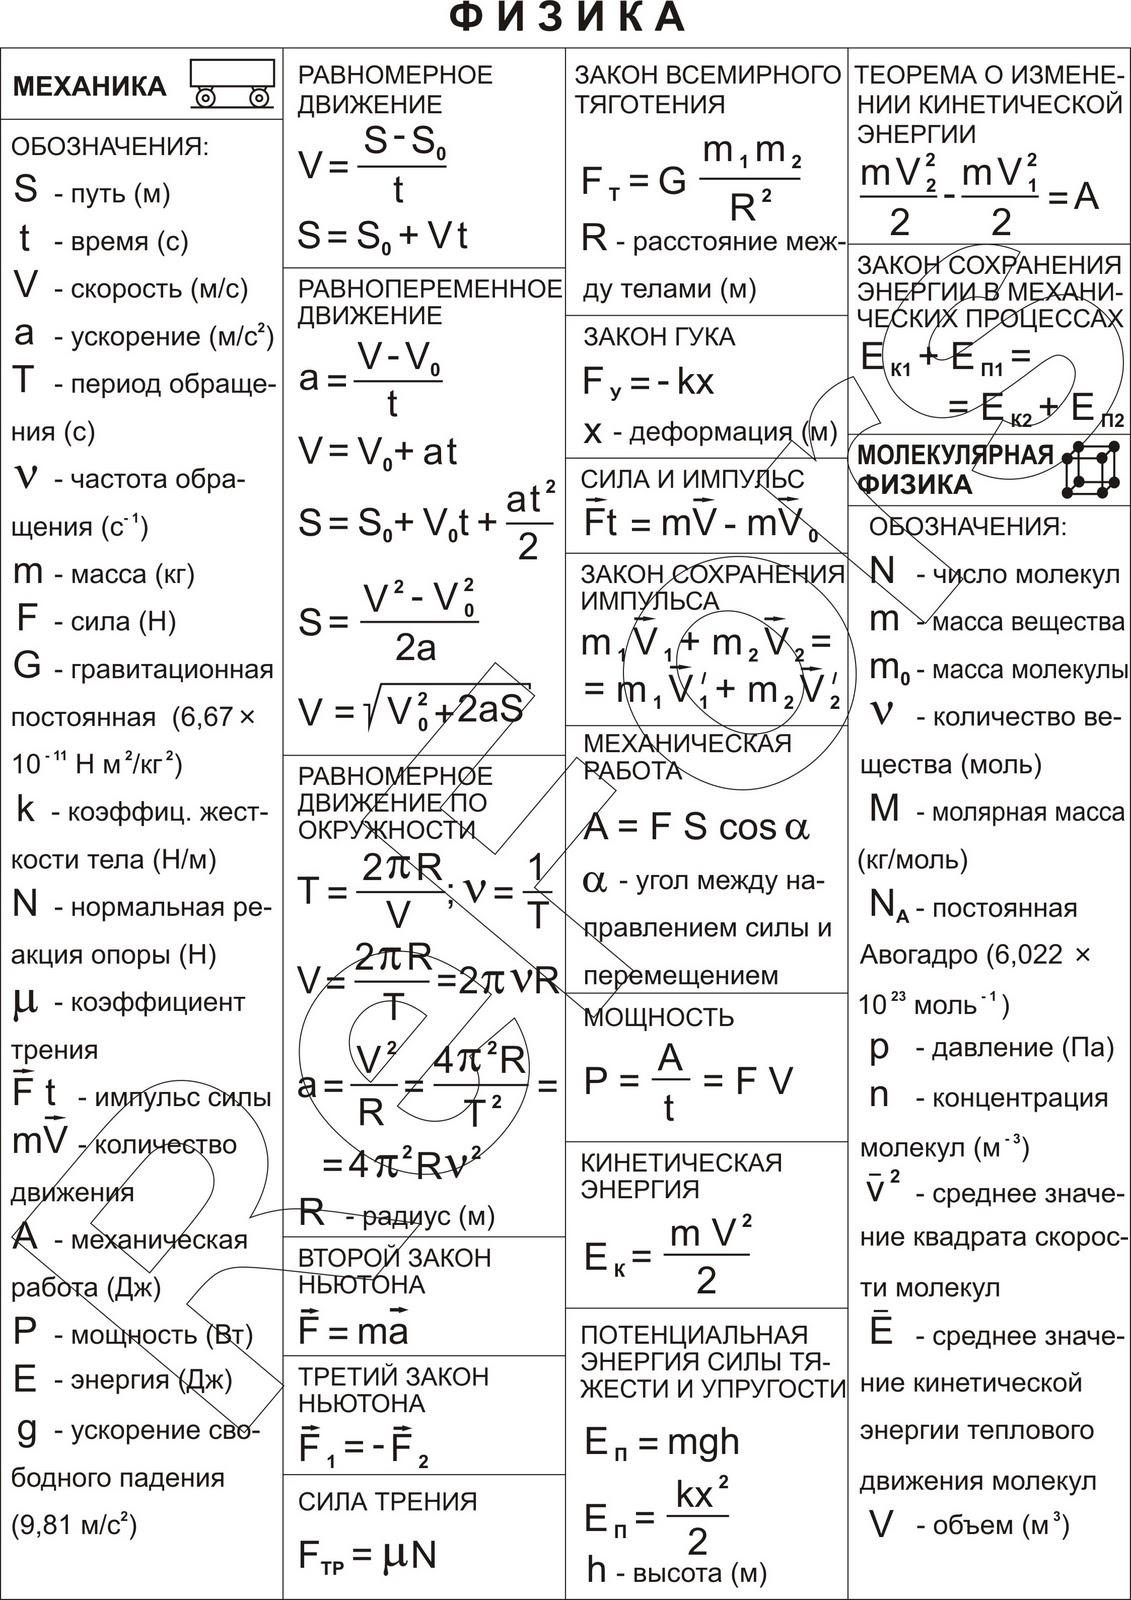 Работа механики физика